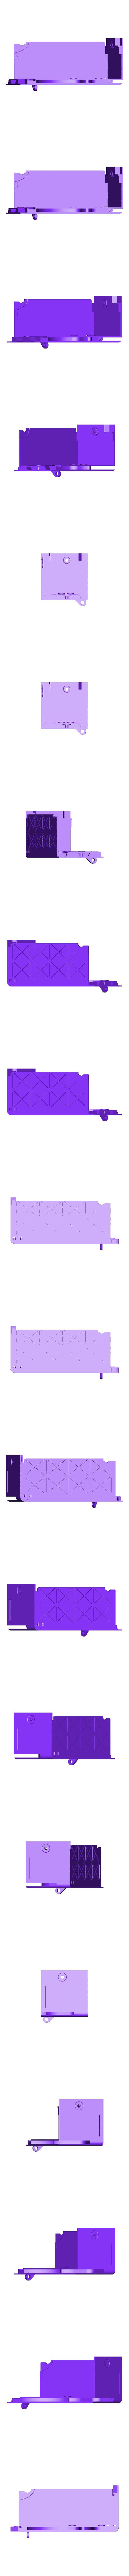 Cont liv 1 n1.stl Download STL file Multiple container ( closed 180x370mm) construction Contenitore multipla trasportabile Multibox • 3D printable design, mikifly10